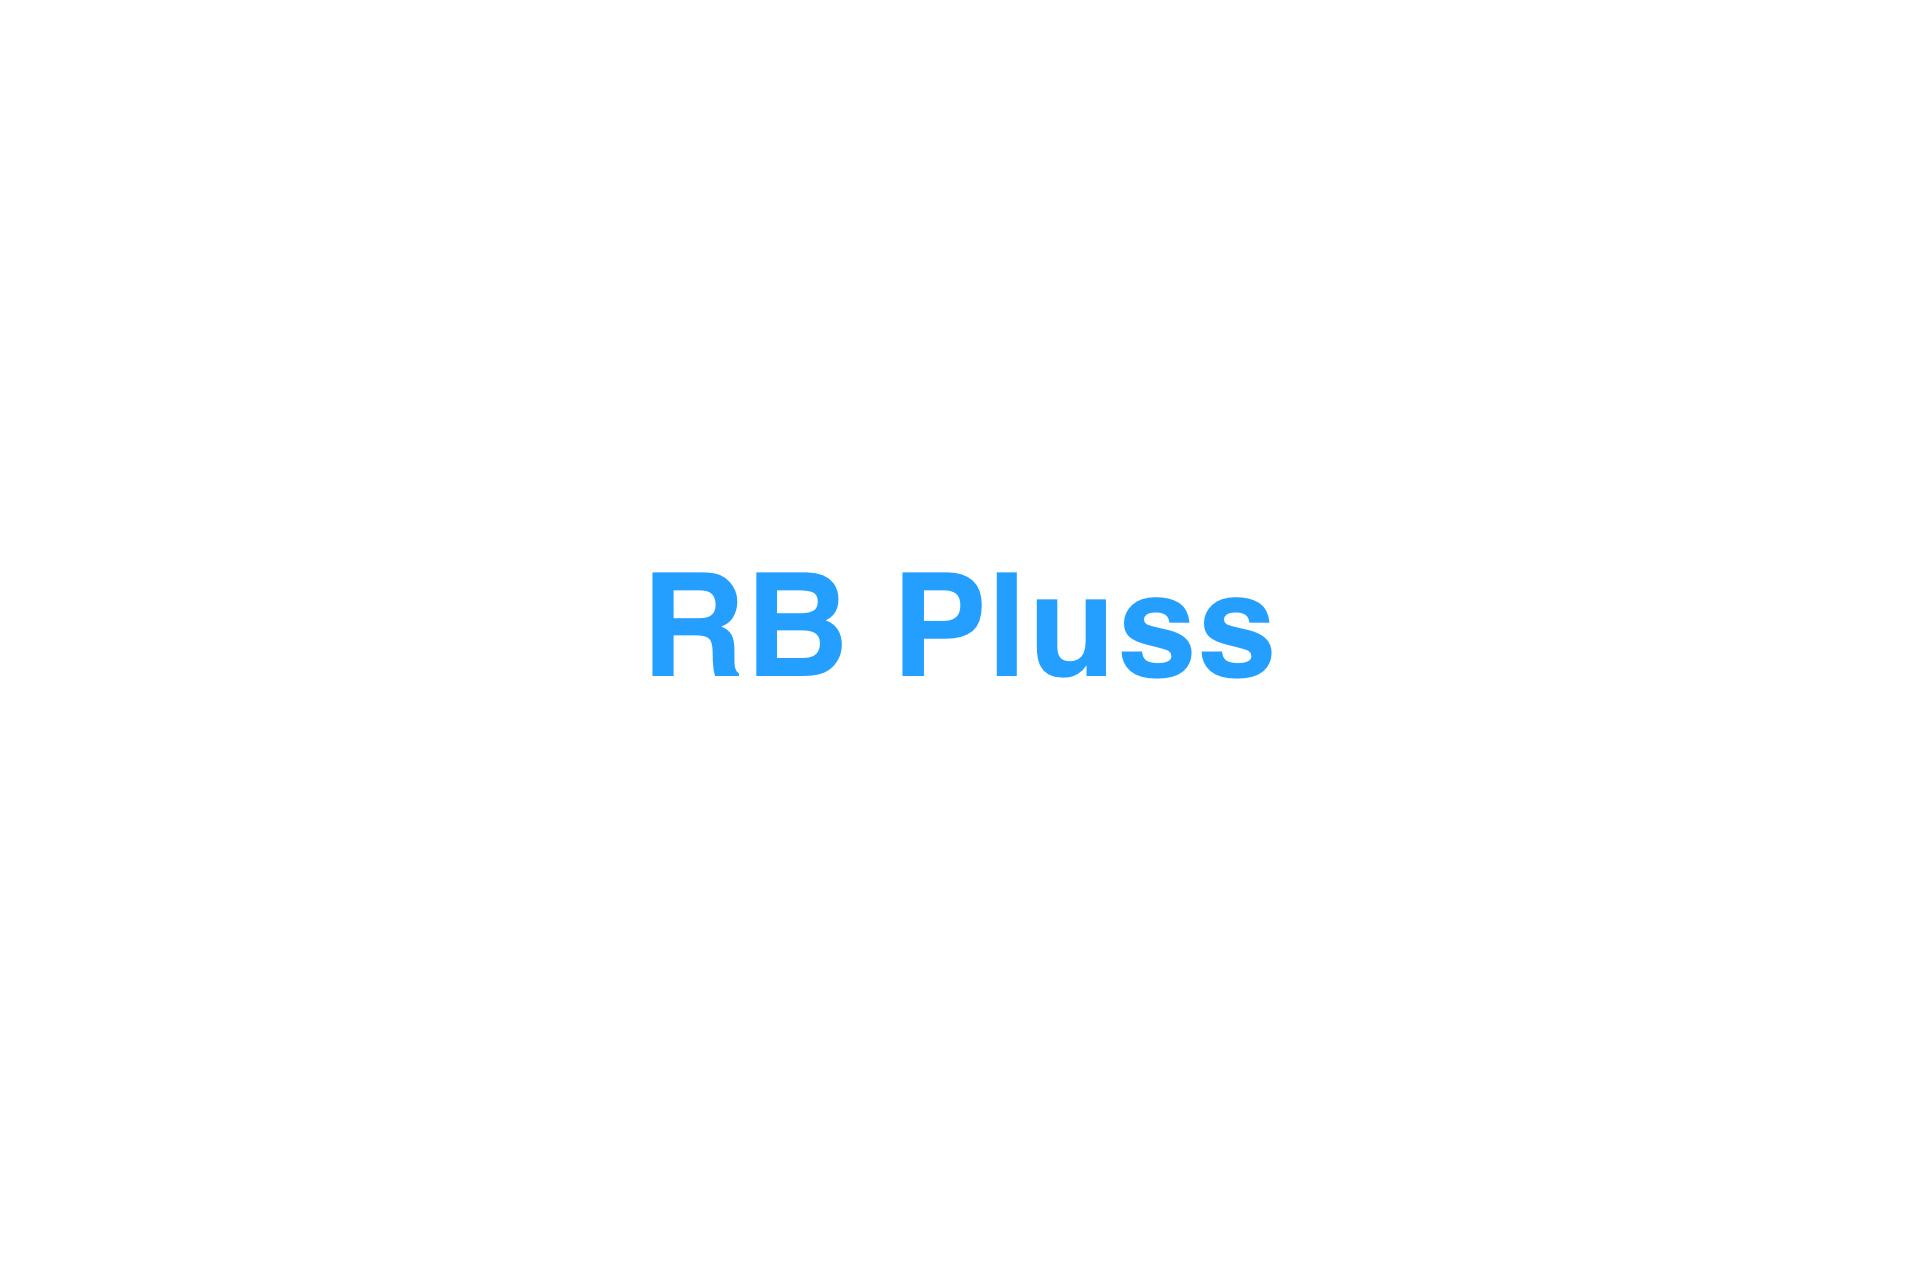 Nordvestlandspakken RB Pluss